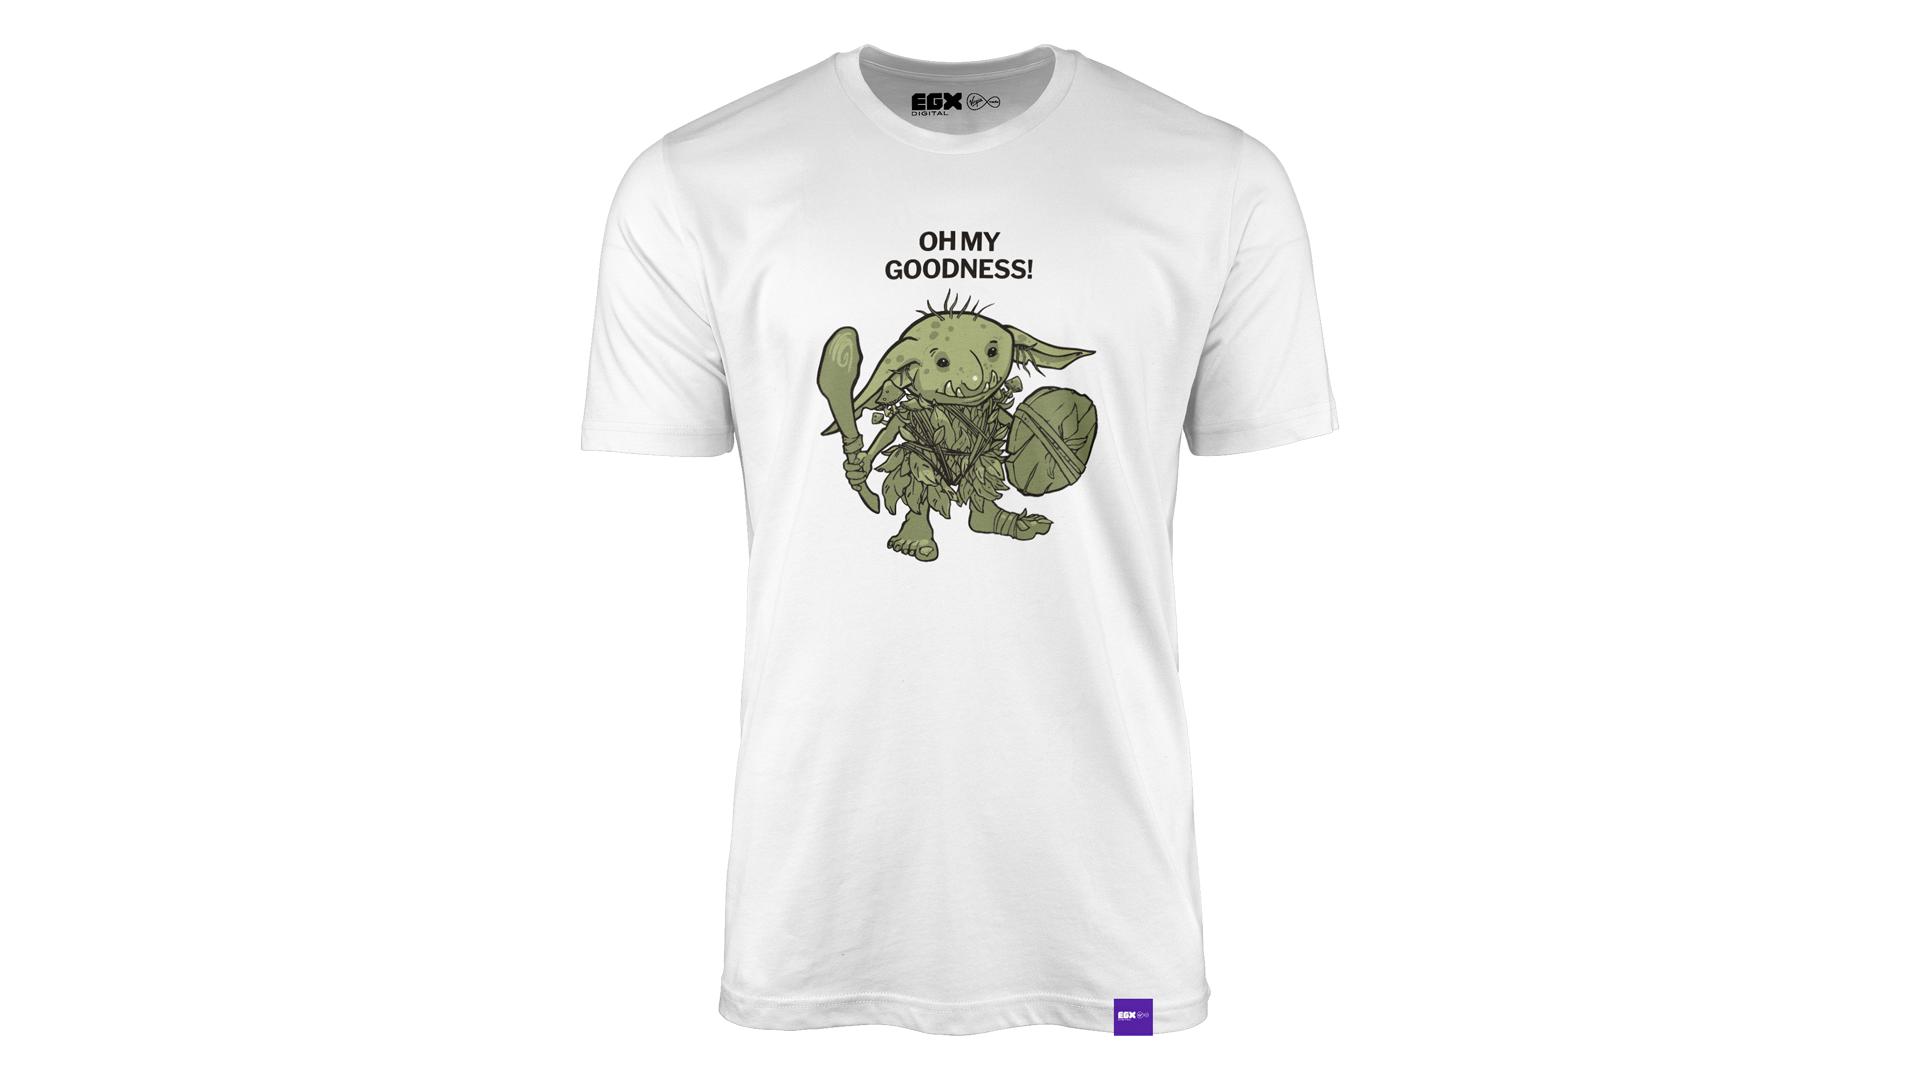 Tim the Goblin T-shirt